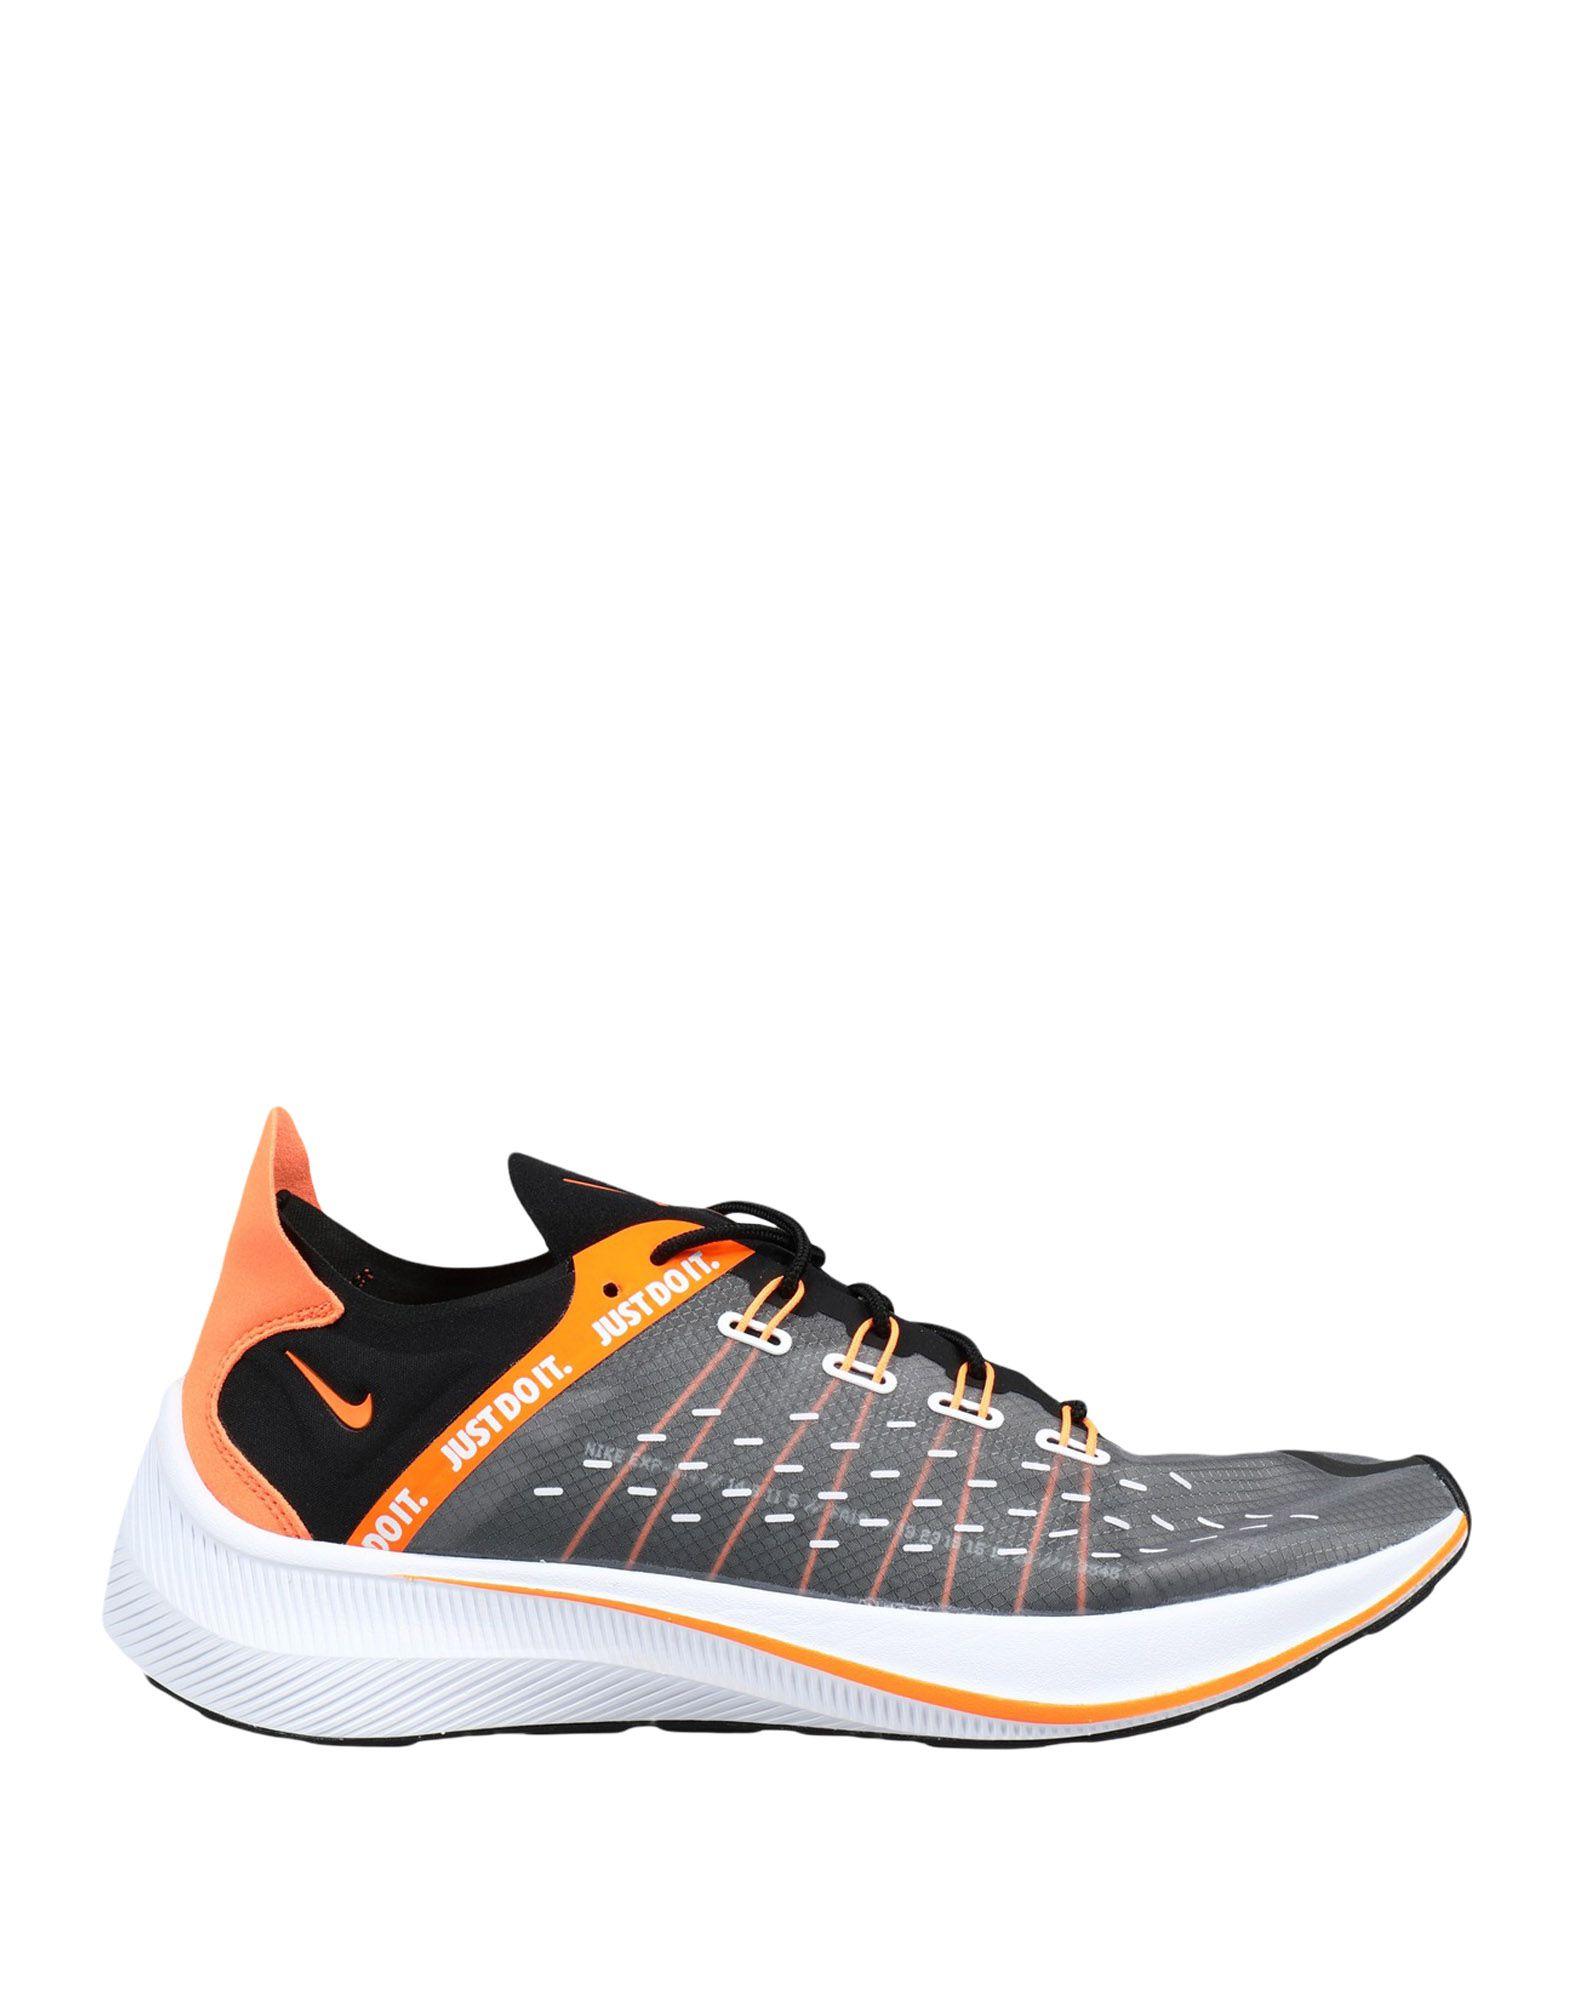 Scarpe da Ginnastica Nike -   Exp-X14 - Uomo - Nike 11538661NN 8a9407